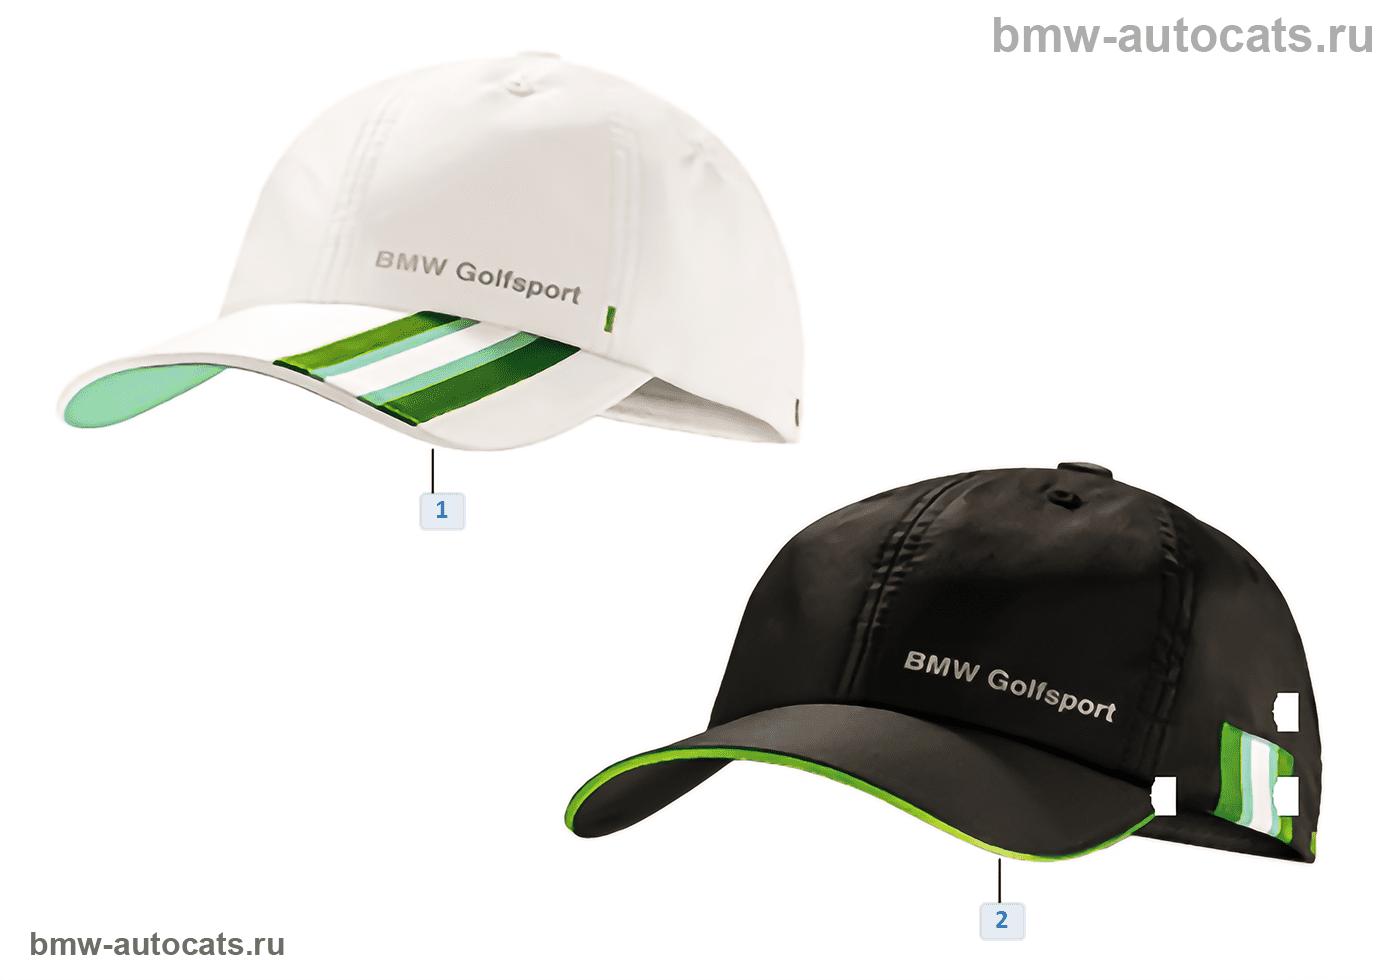 BMW Golfsport — Кепки 2015/17